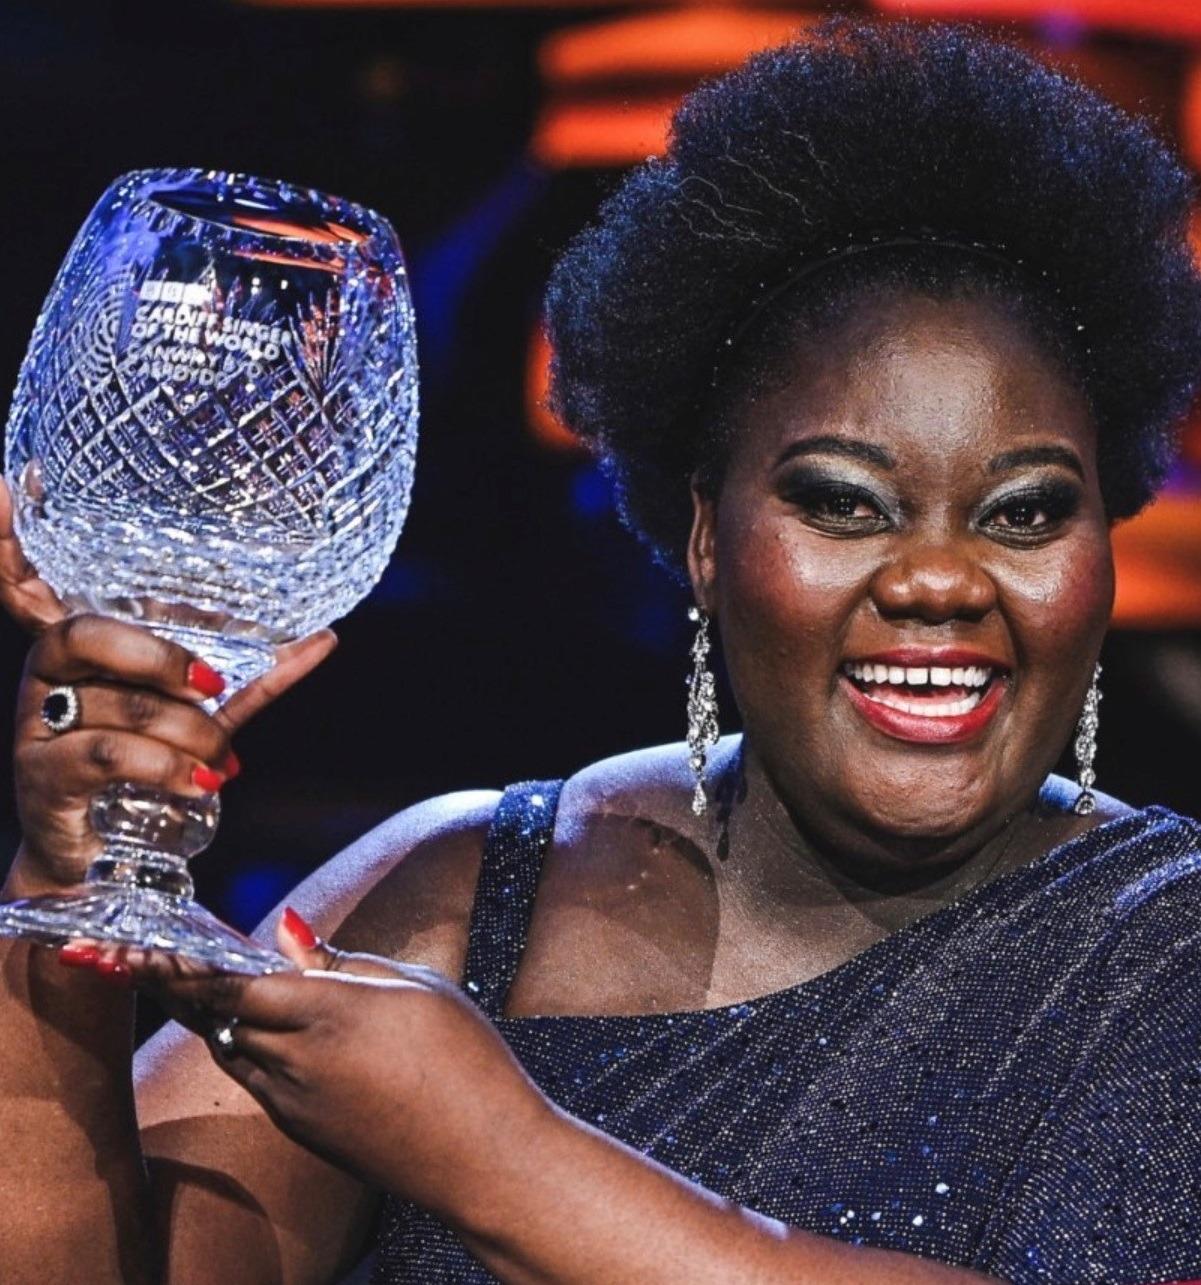 Goodenough Member wins major international Song Prize